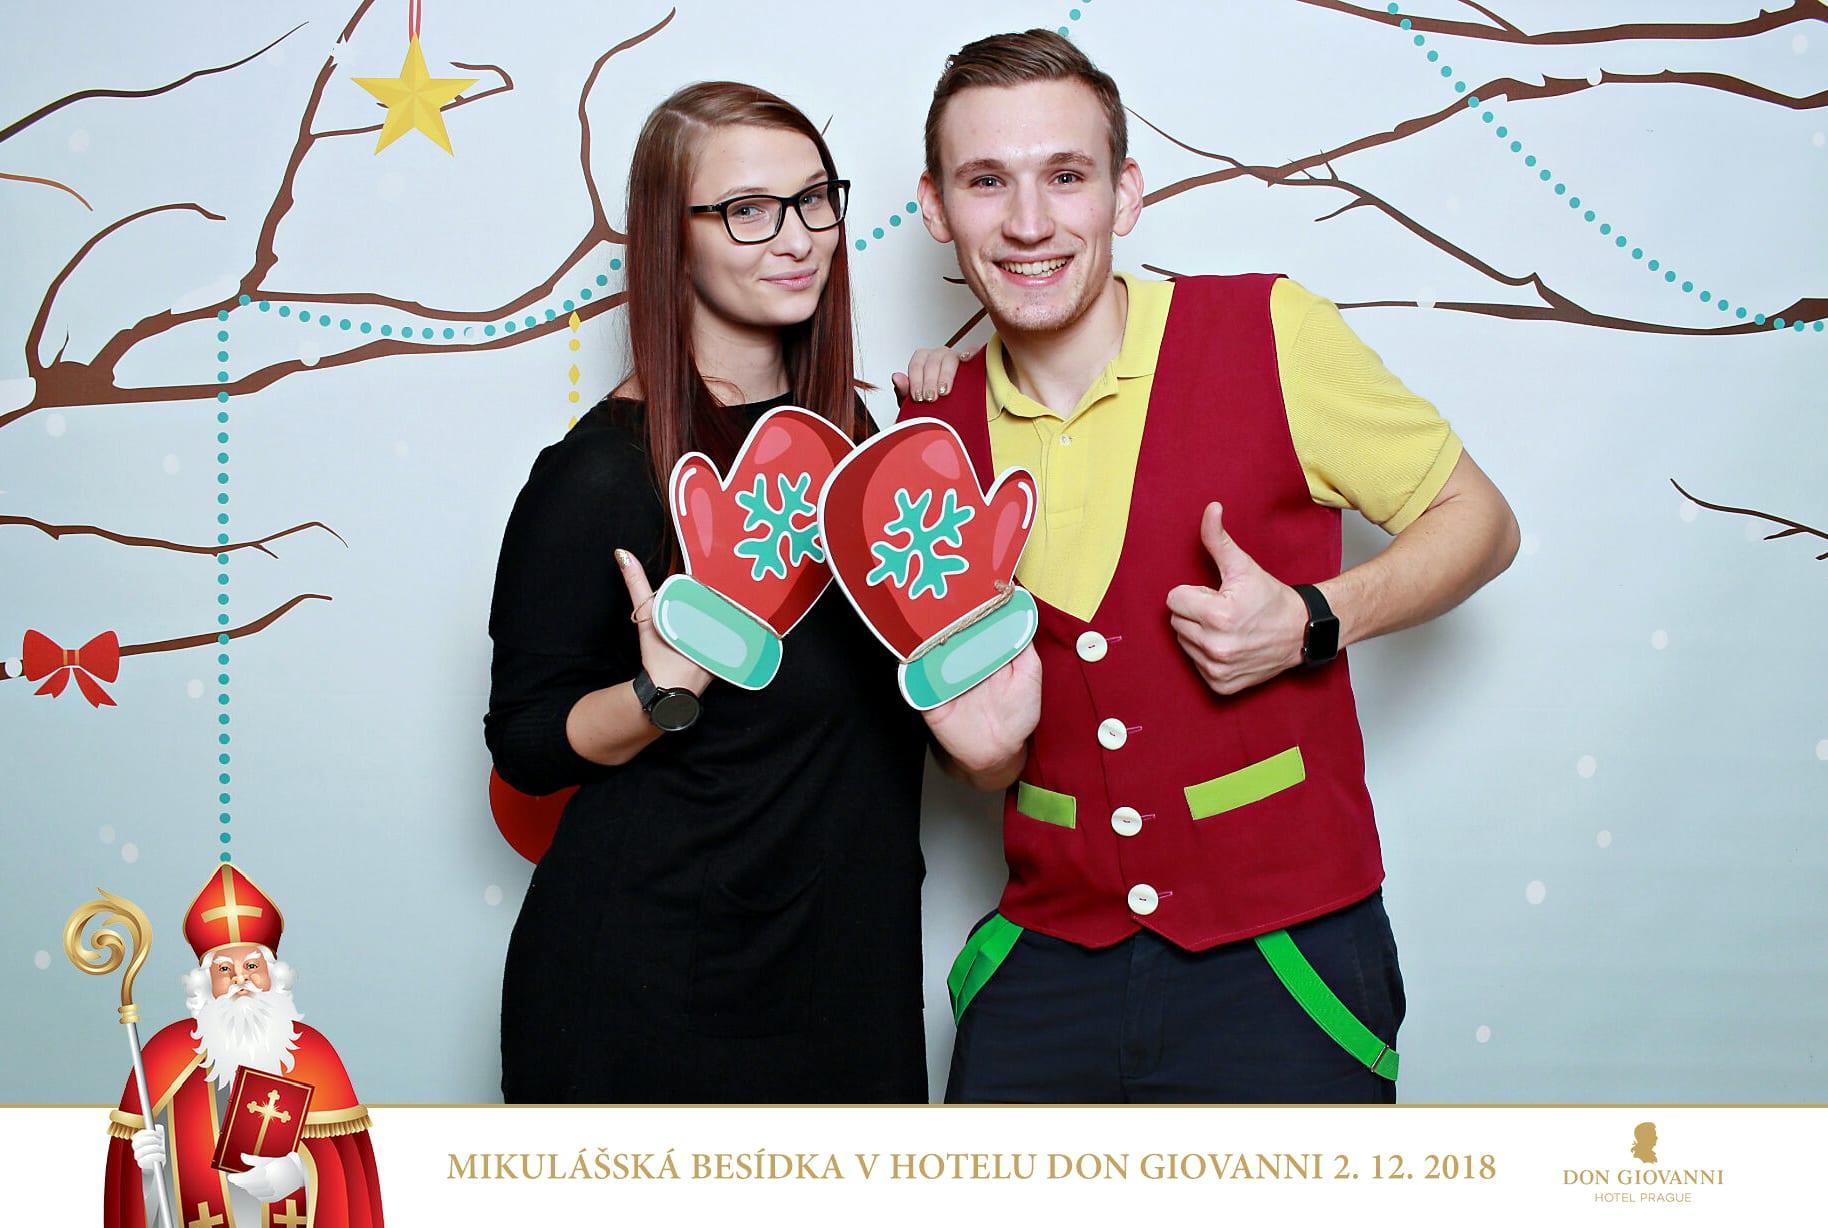 fotokoutek-milulasska-besidka-v-hotelu-don-giovanni-2-12-2018-530686